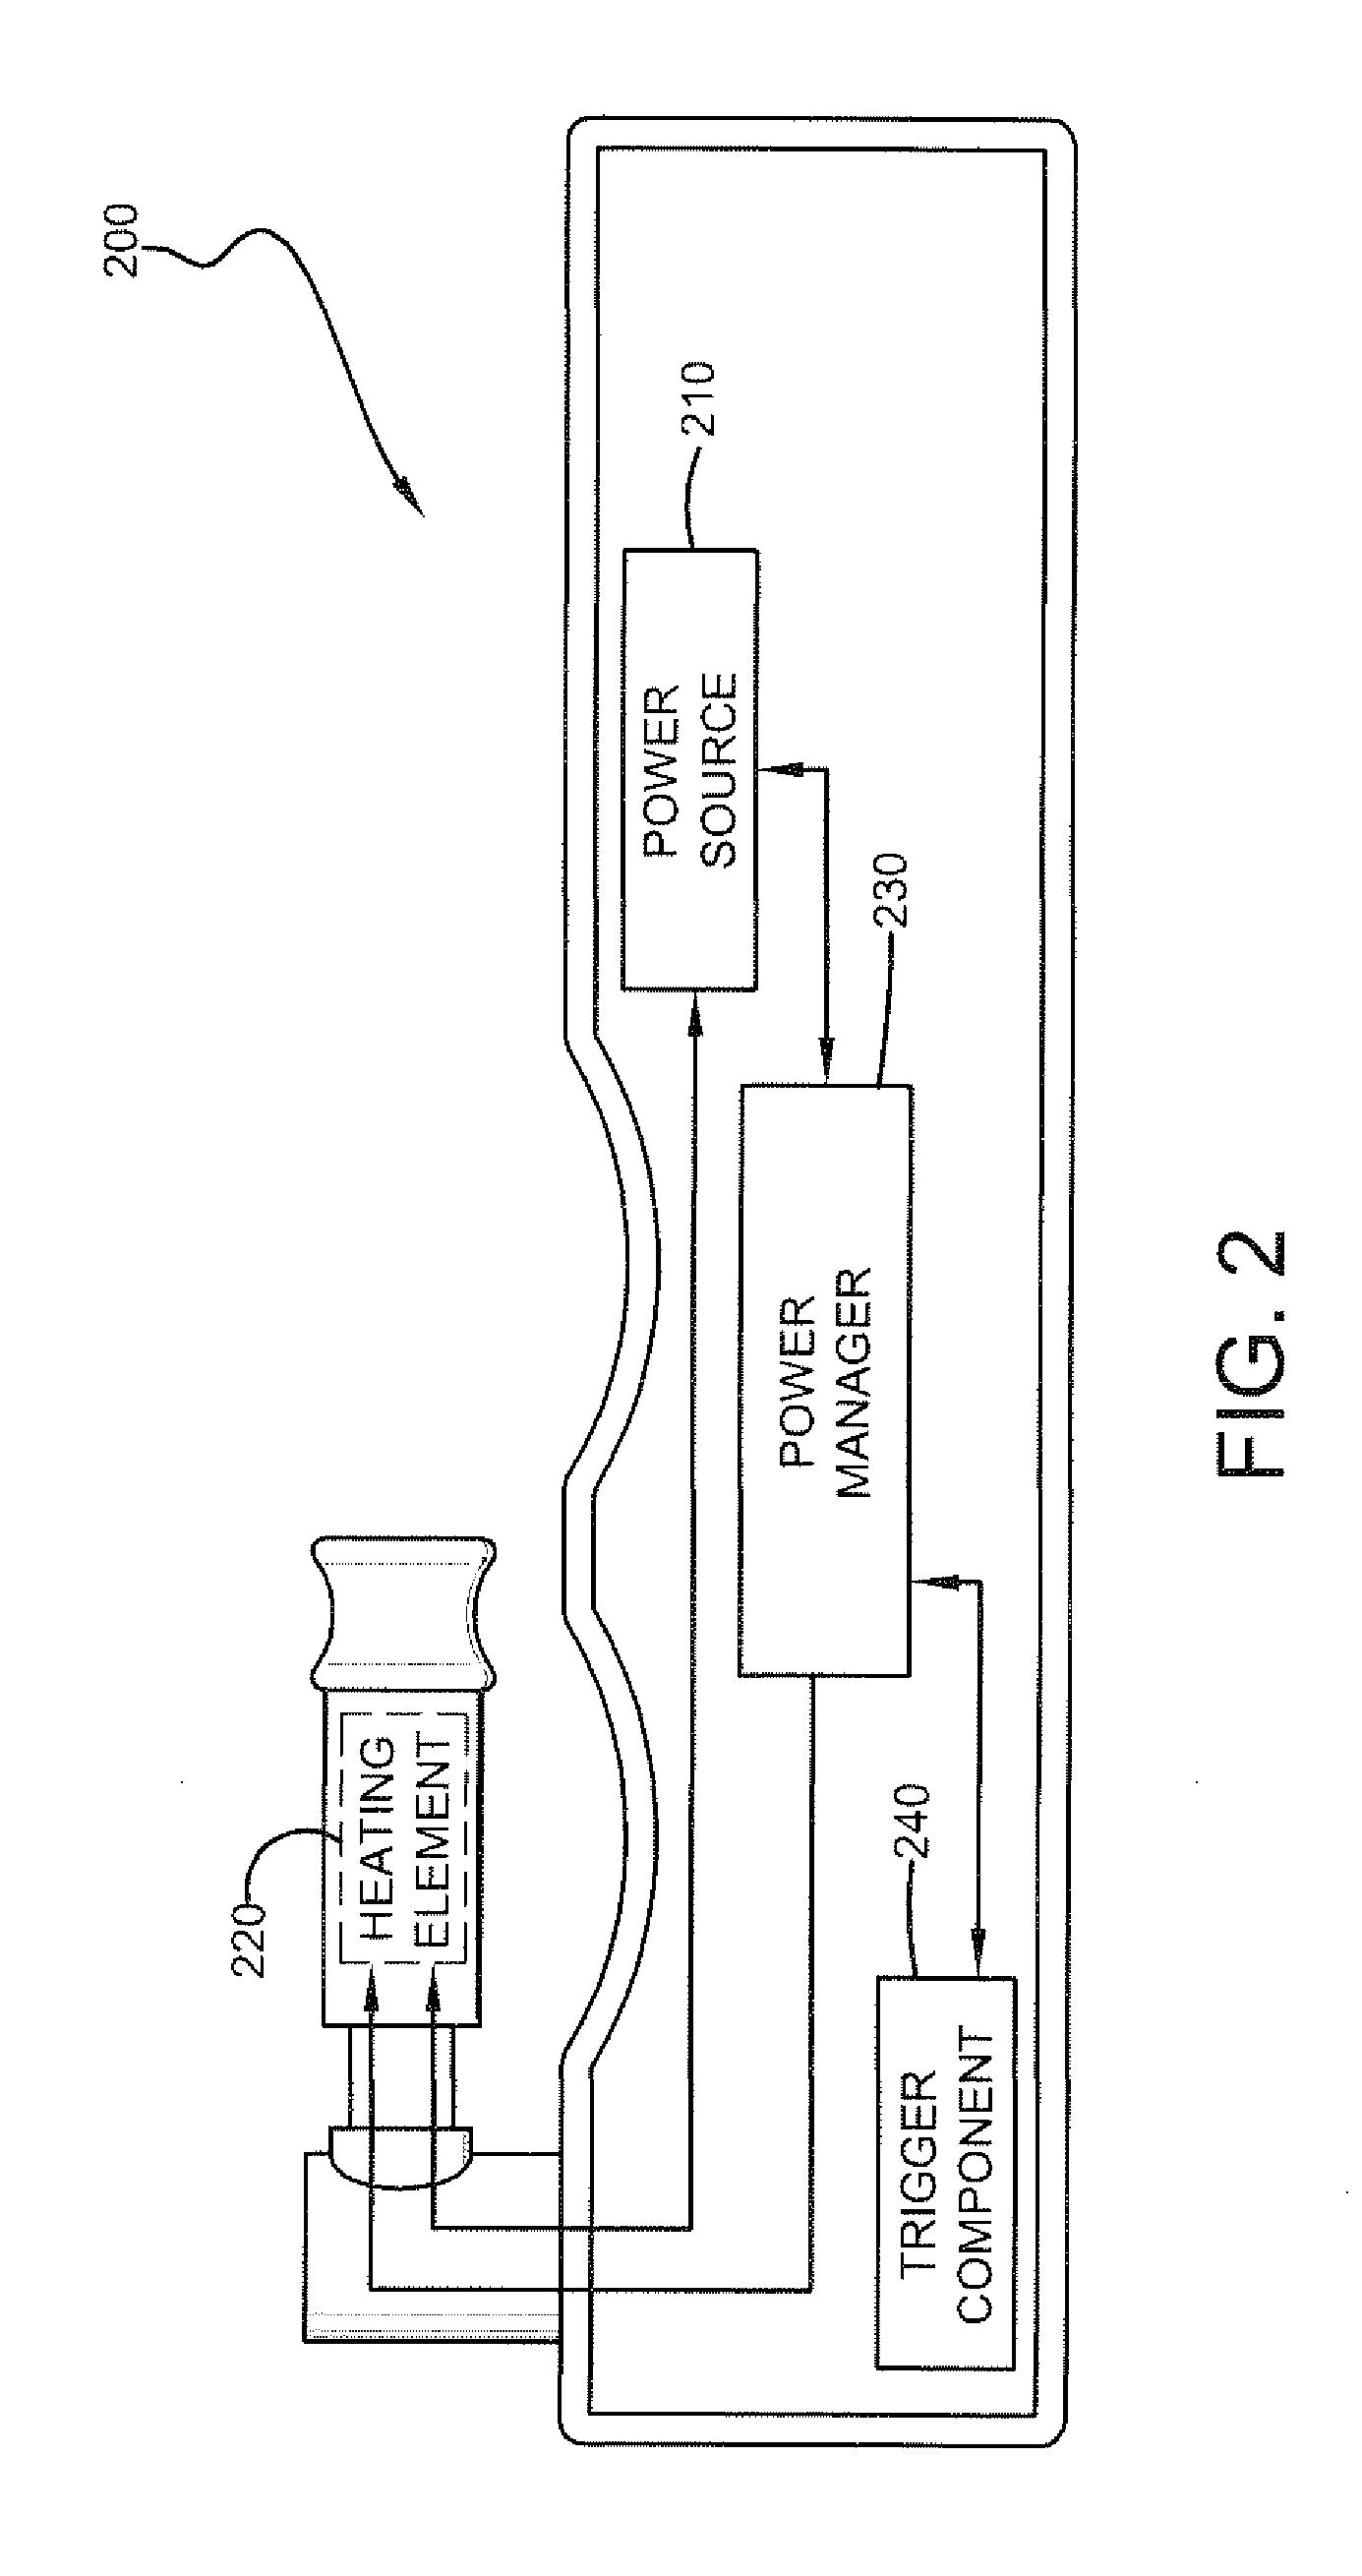 US20130104916A1 20130502 D00002 patent us20130104916 electronic vaporizer that simulates smoking vaporizer wiring diagram at bayanpartner.co